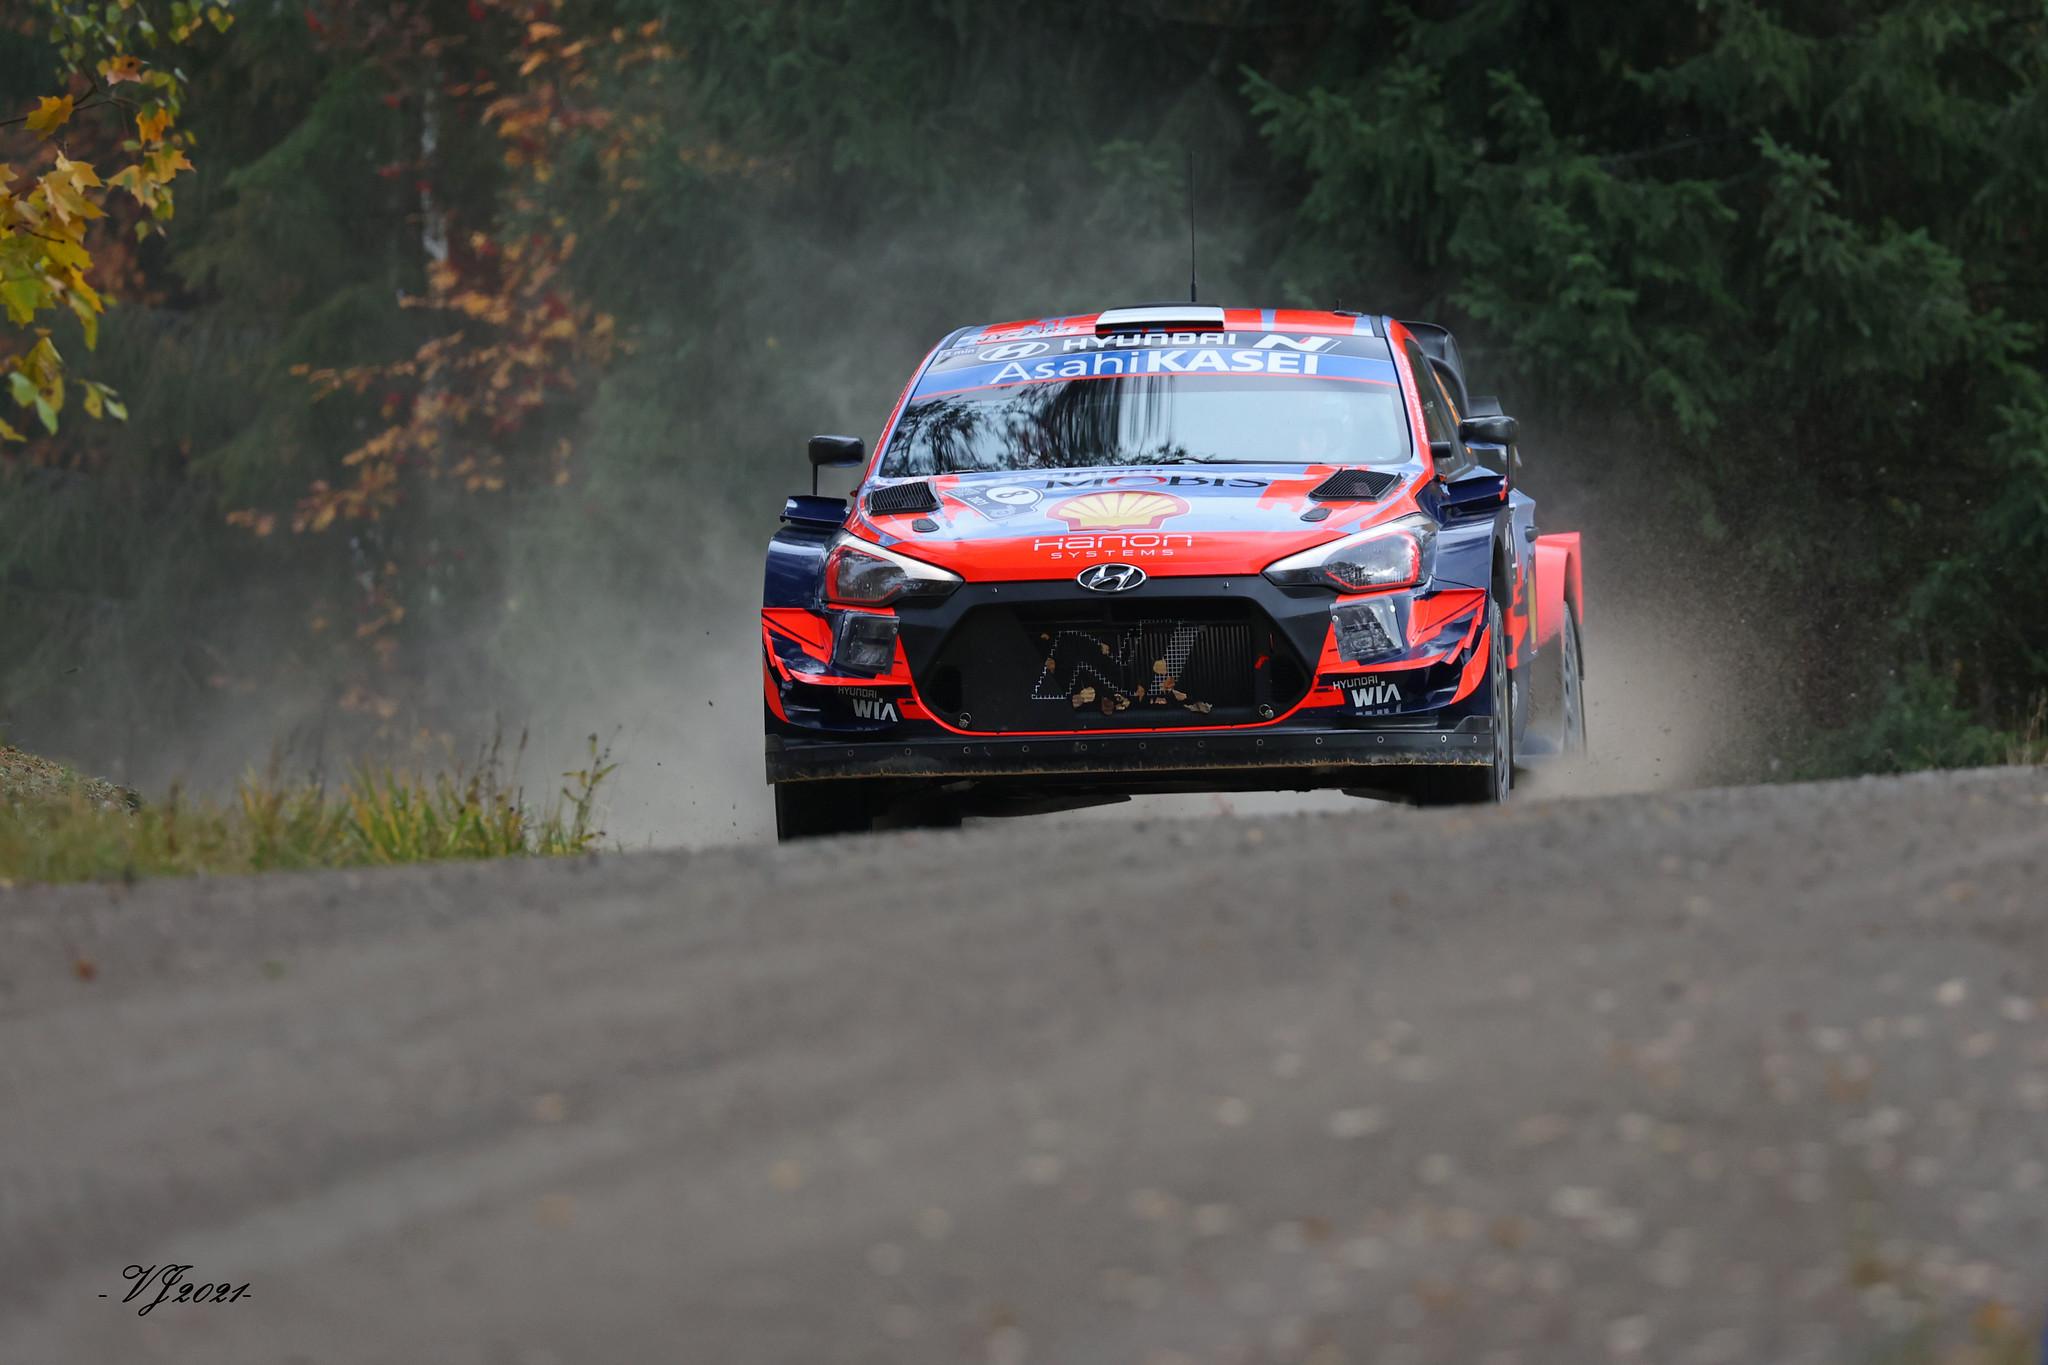 Ott Tänak, Hyundai i20 WRC